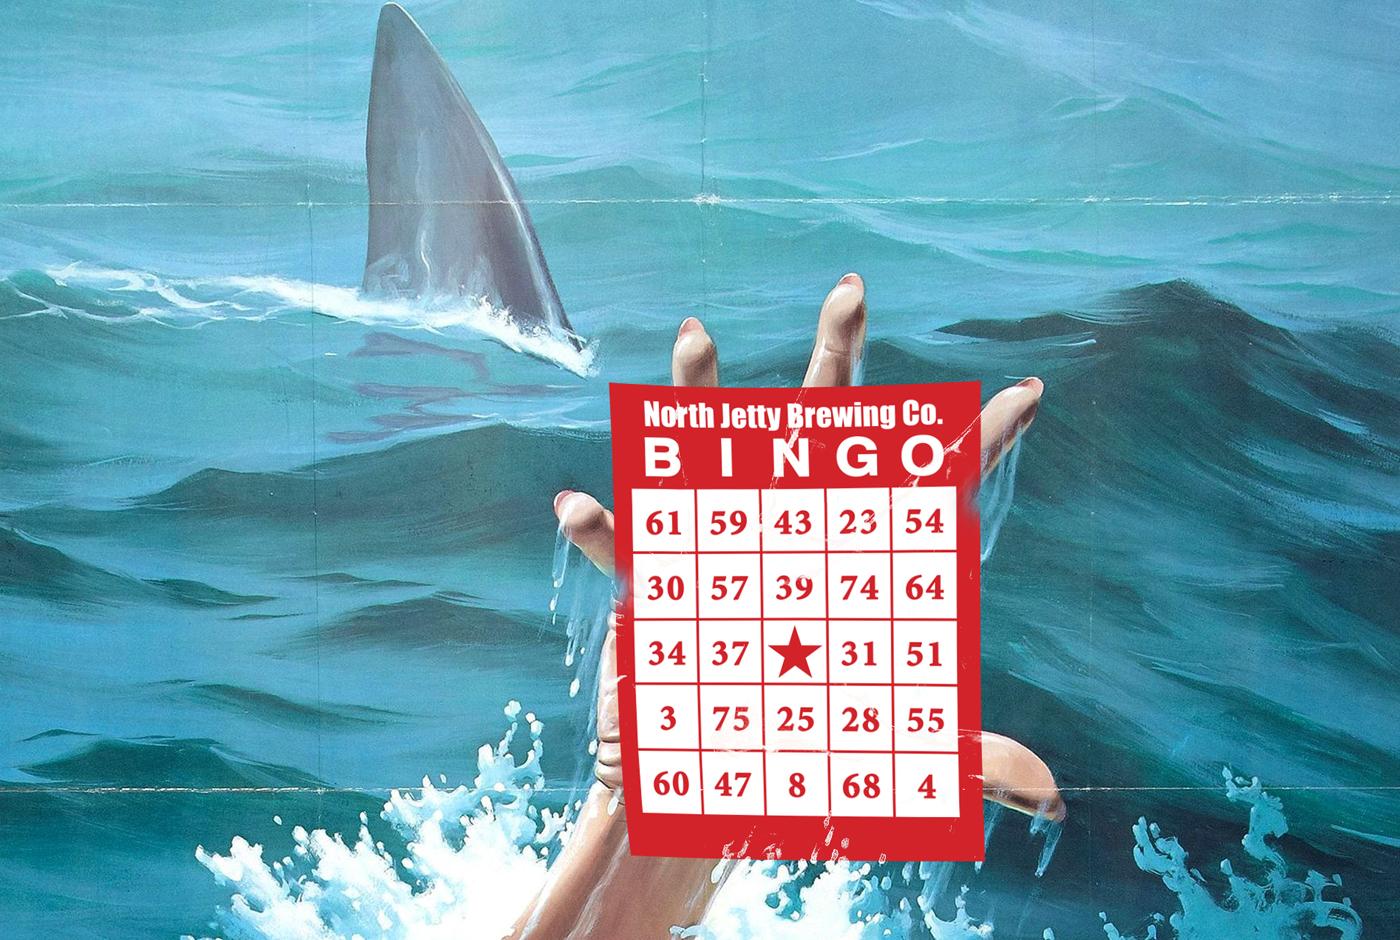 North-Jetty-Brewing-Beach-Blanket-Bingo-Tacoma-calendar